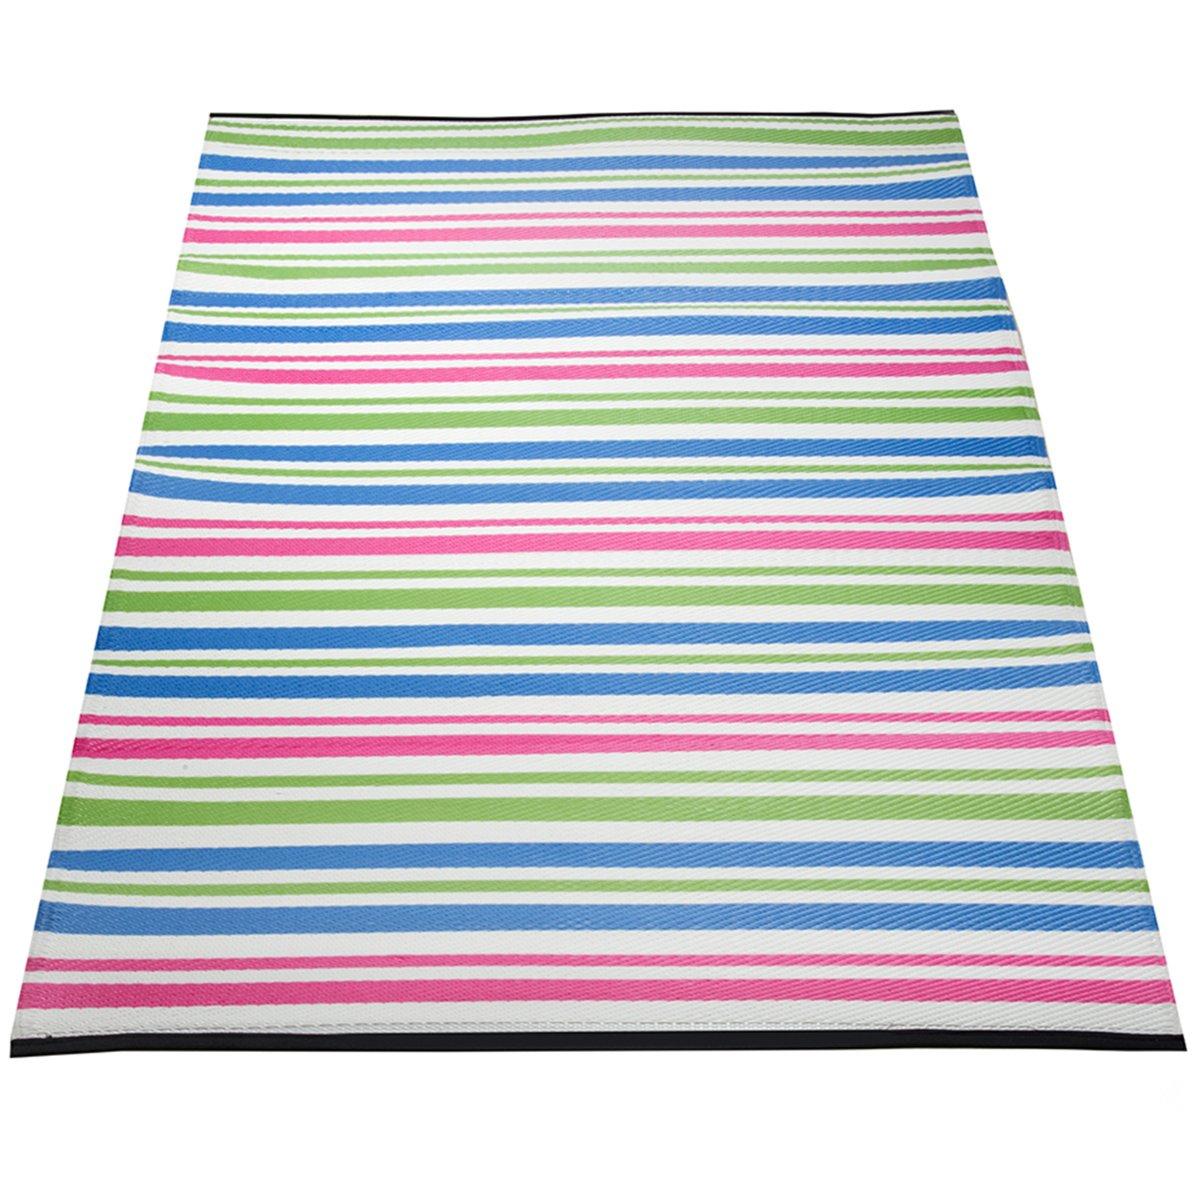 Yankee Trader 4' X 6' Indoor/Outdoor Decorative Reversible Patio Carpet Rug, Pattern 12